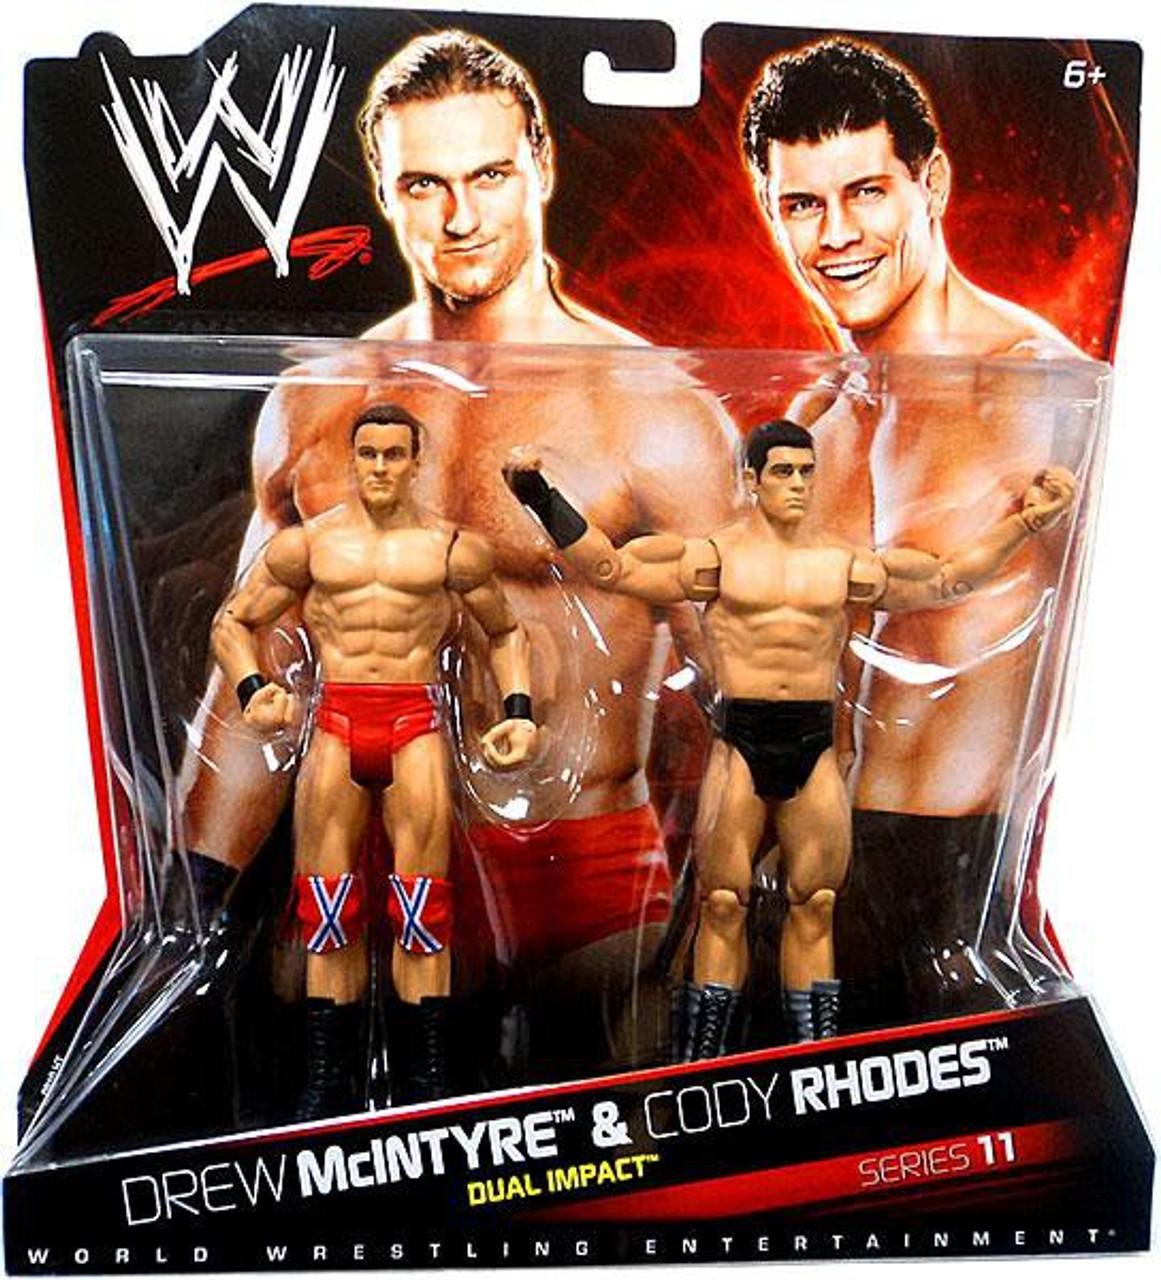 Wwe Wrestling Battle Pack Series 11 Drew Mcintyre Cody Rhodes Action Figure 2 Pack Mattel Toys Toywiz